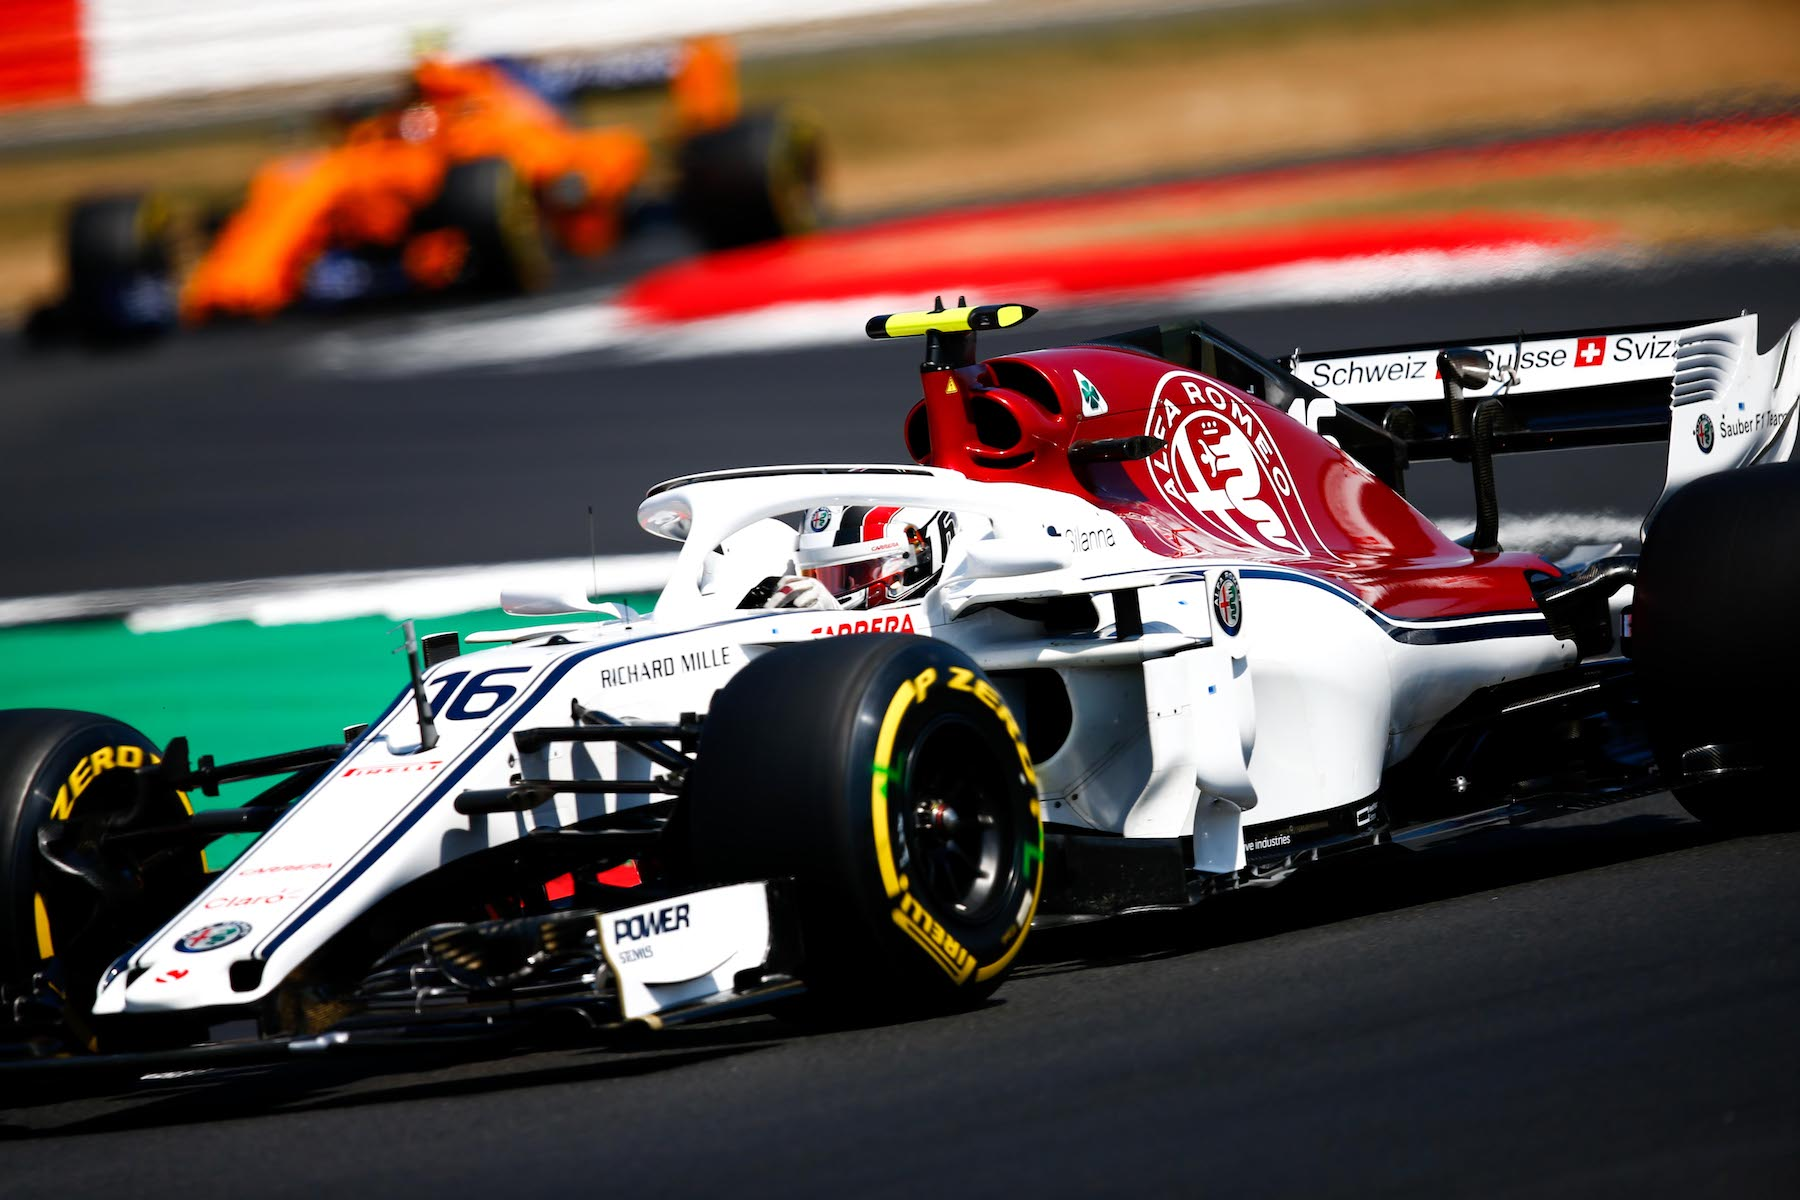 2018 Charles Leclerc | Sauber C37 | 2018 British GP Q3 1 copy.jpg